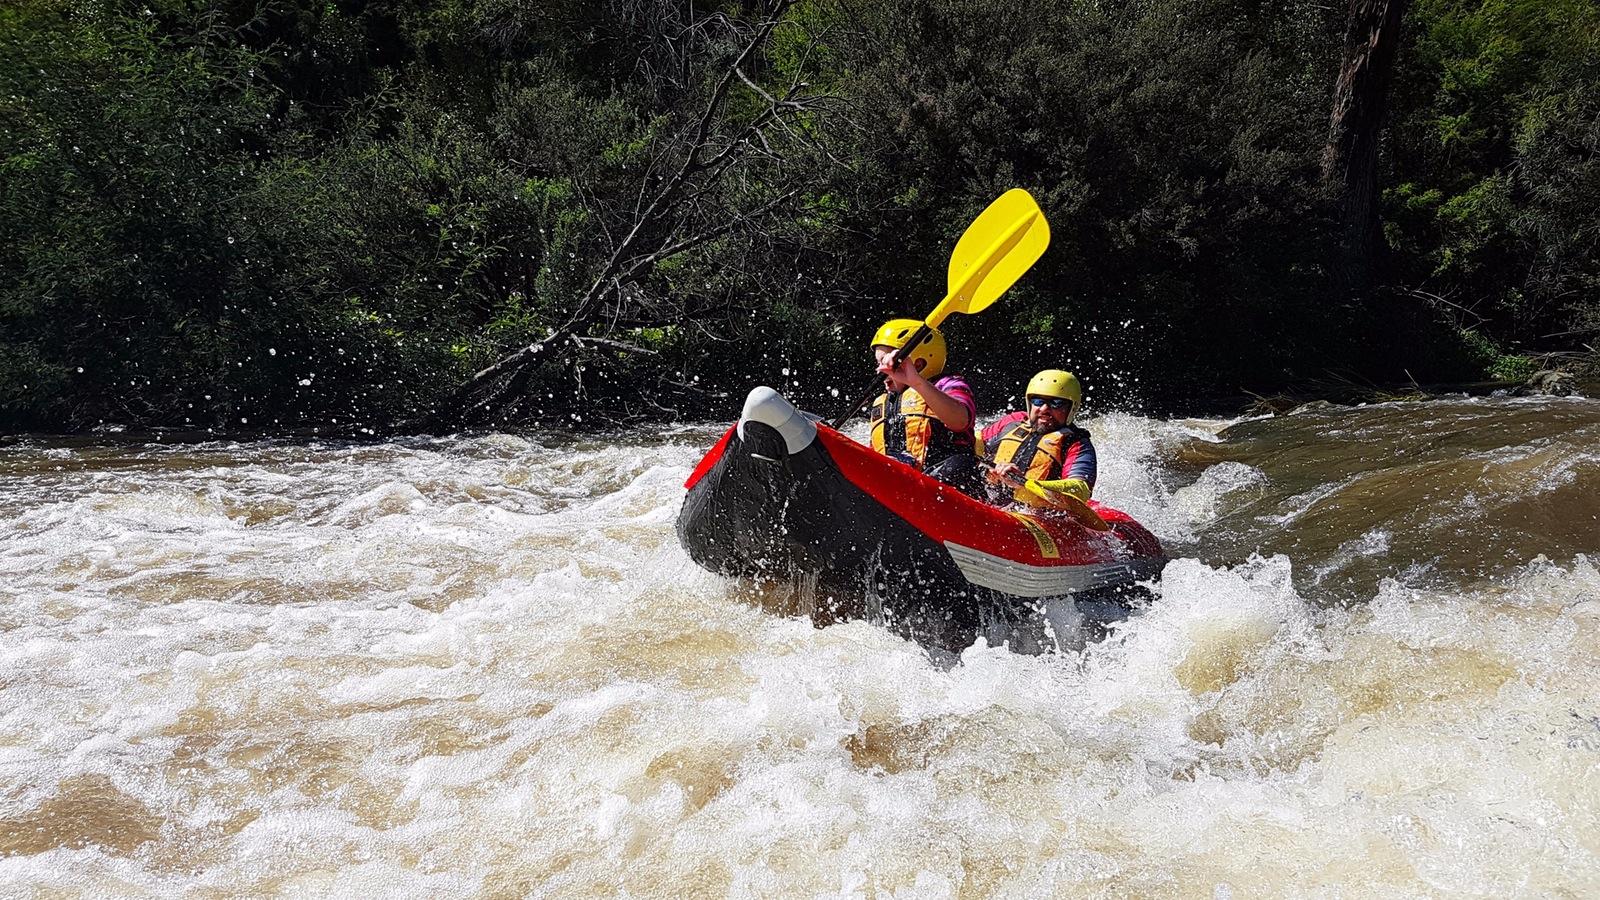 Whitewater kayaking, Yarra river, Melbourne, Australia